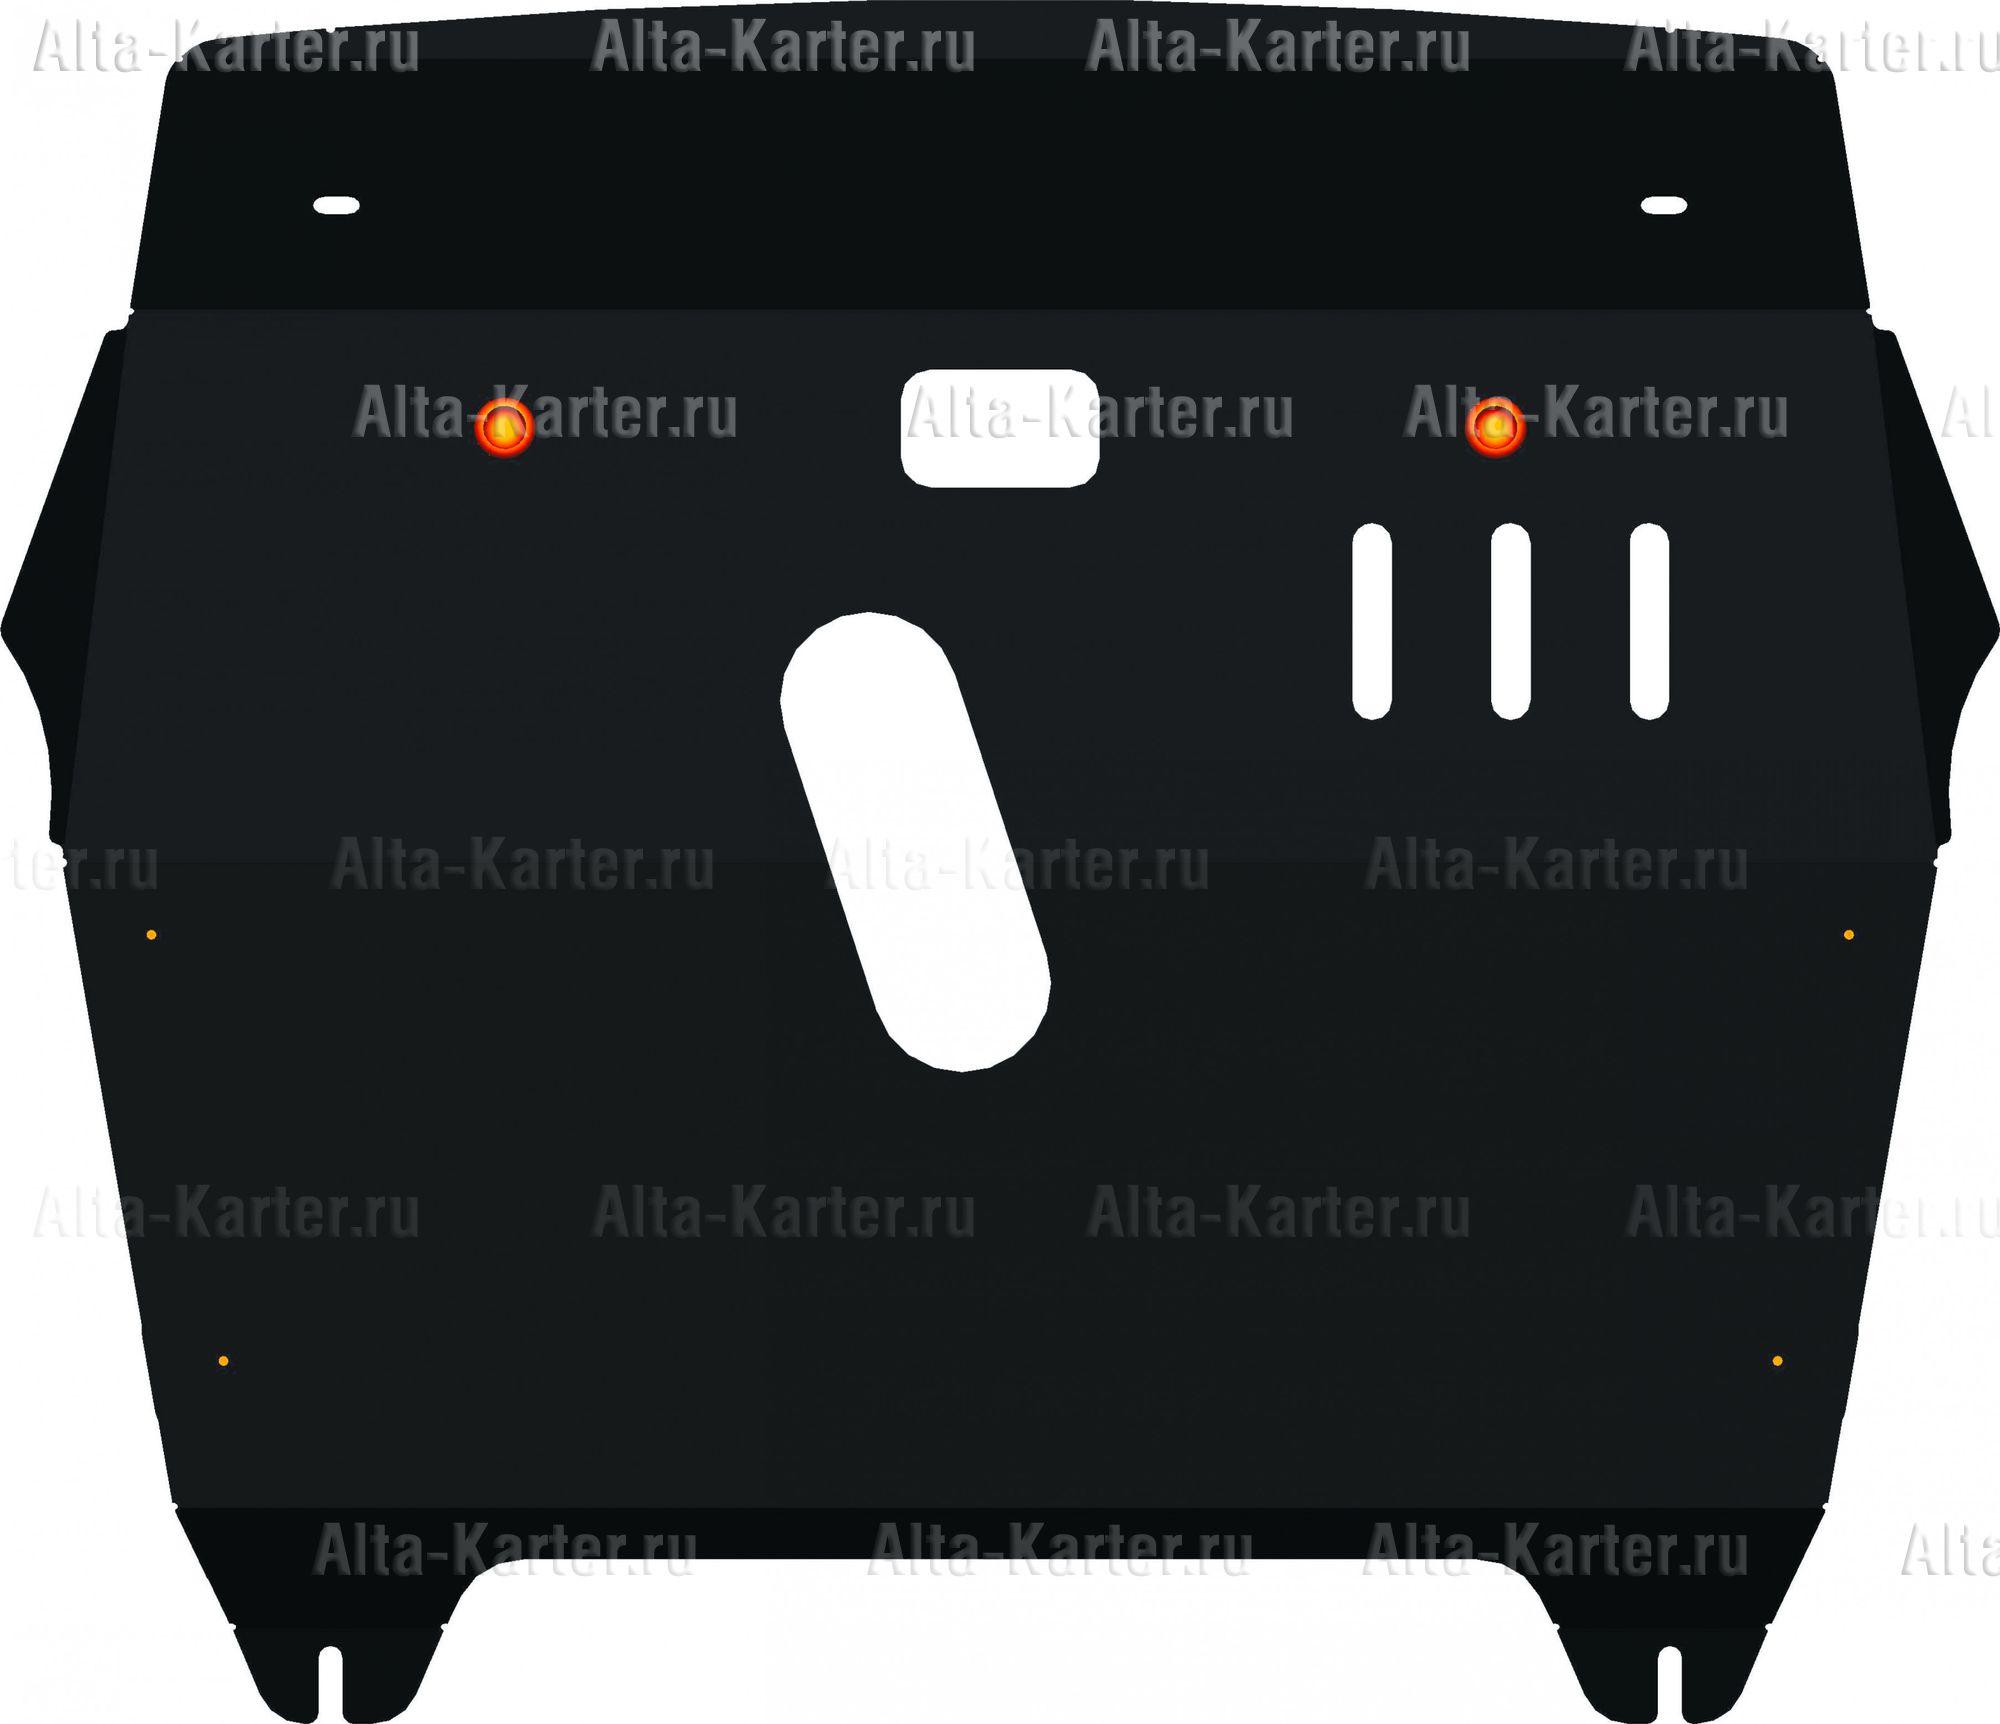 Защита Alfeco для картера и КПП Toyota Highlander I 2003-2007. Артикул ALF.24.28